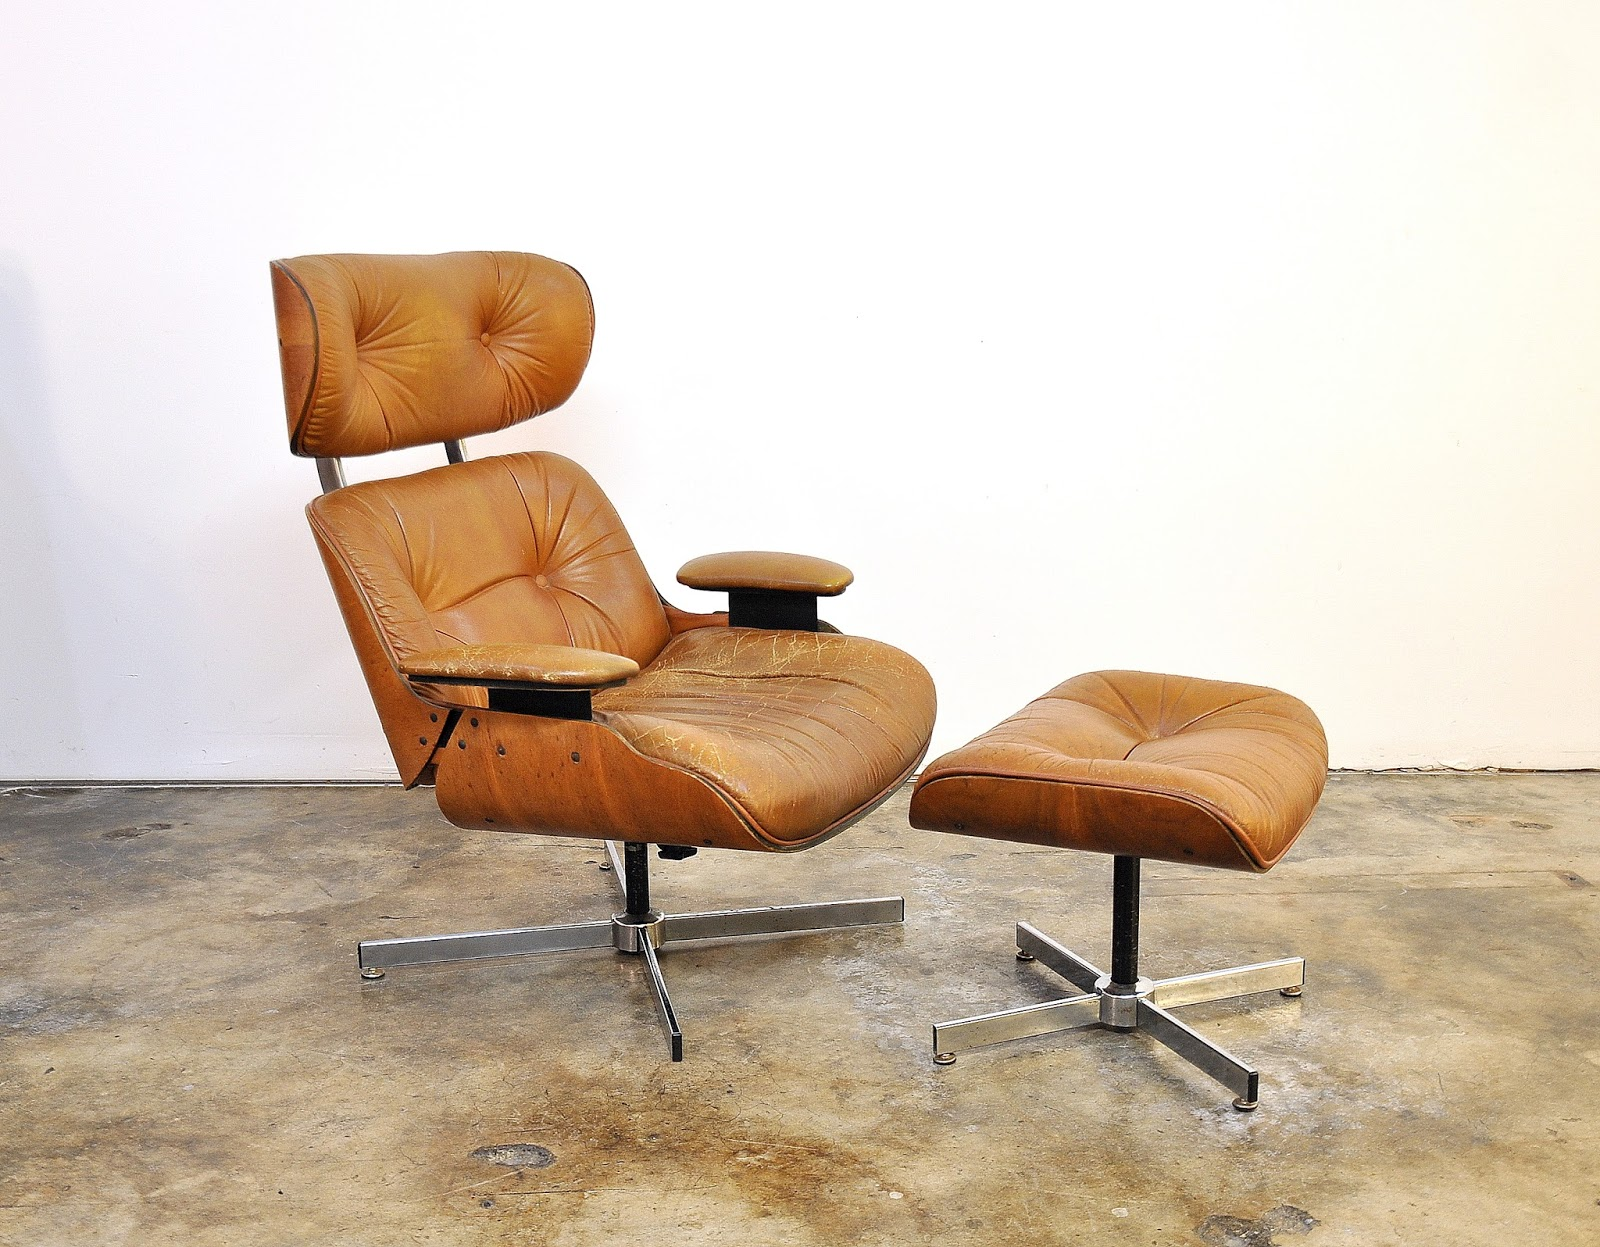 Selig Eames Chair High With Adjustable Footrest Select Modern Frank Doerner For Style